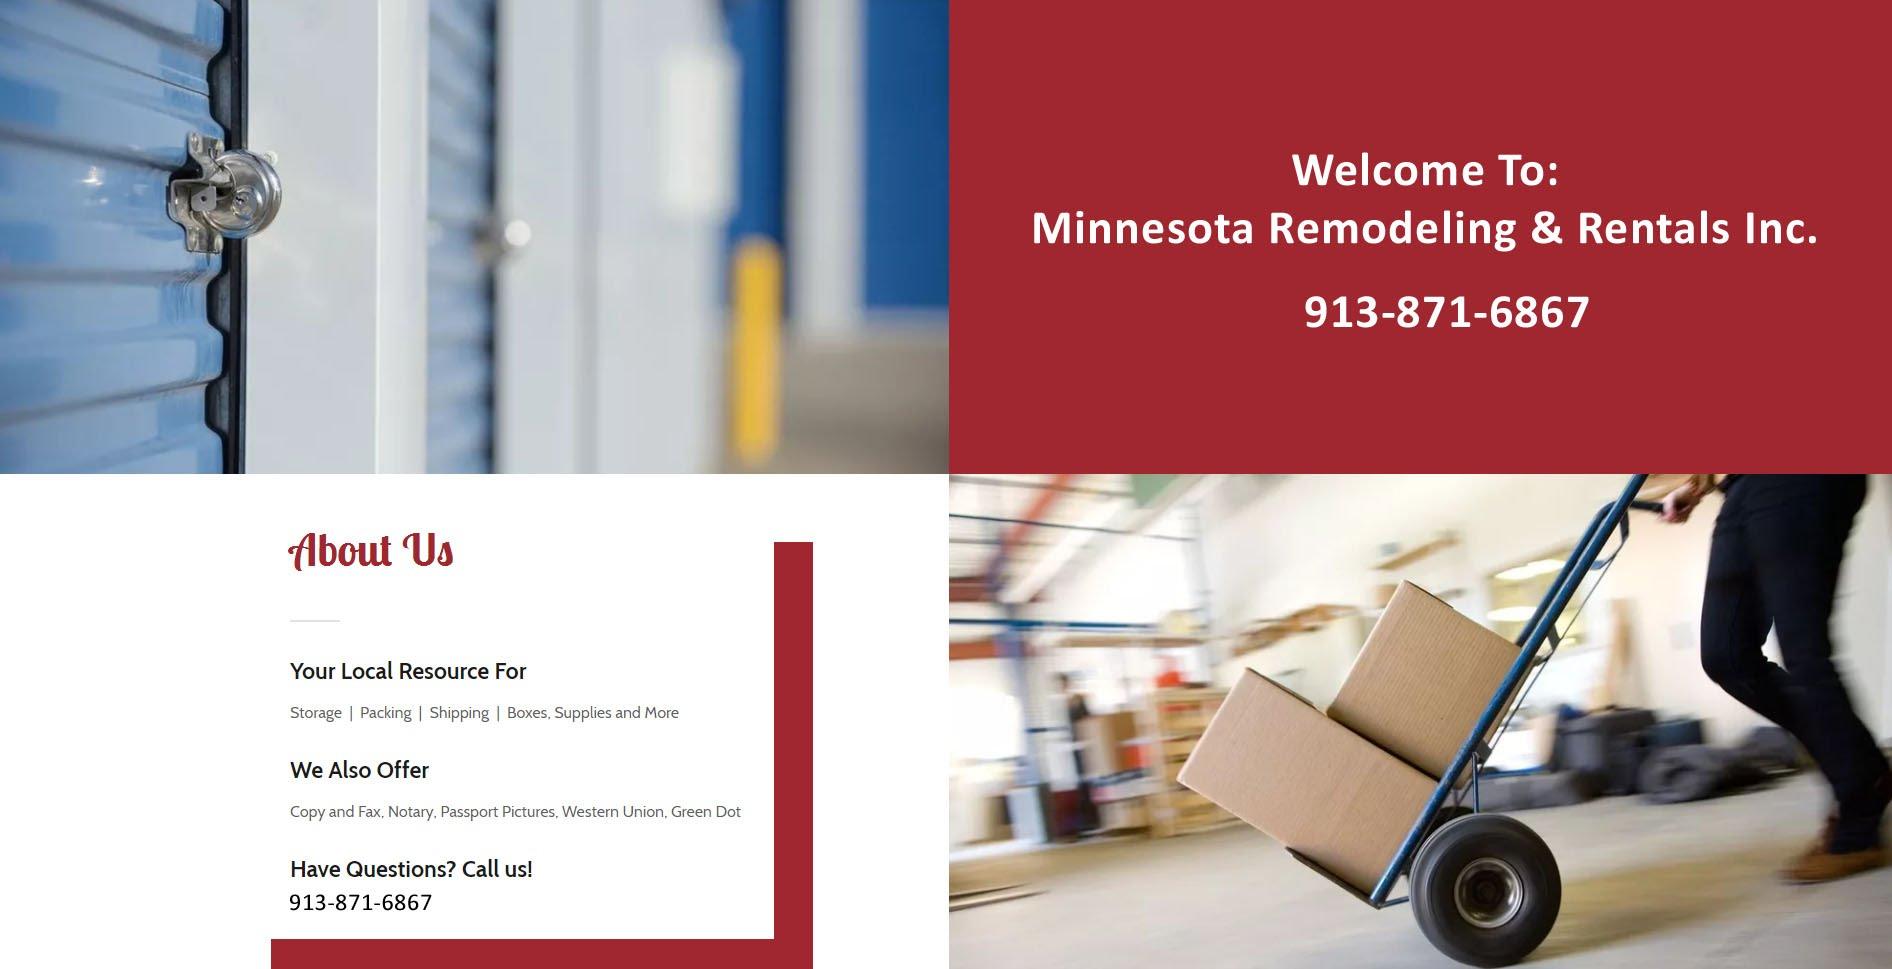 Awesome Minnesota Remodeling u Rentals Inc